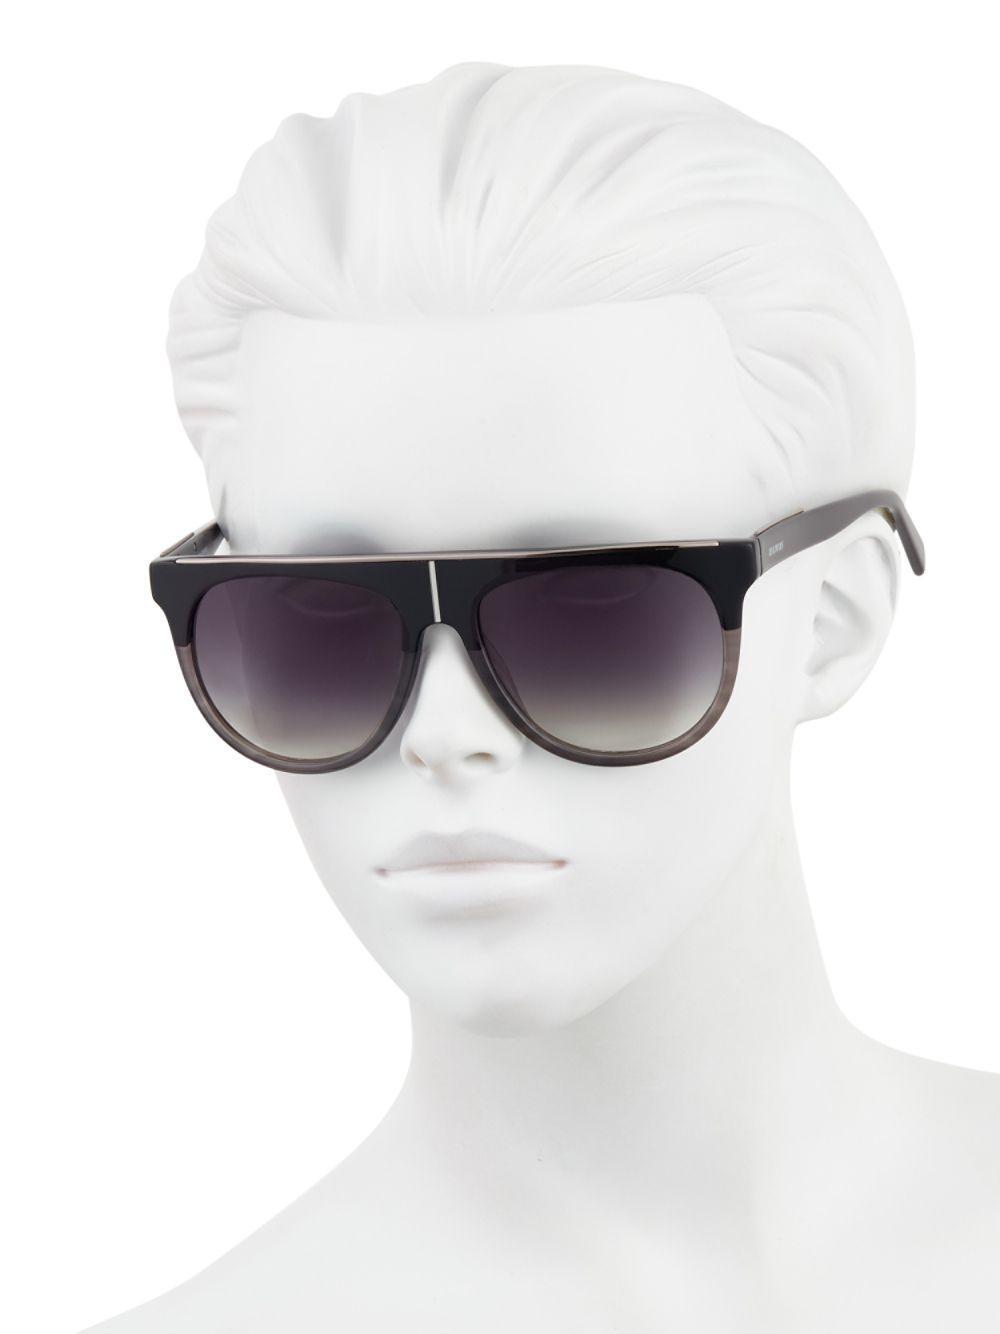 Balmain 55mm Two-tone Flat-top Sunglasses in Black